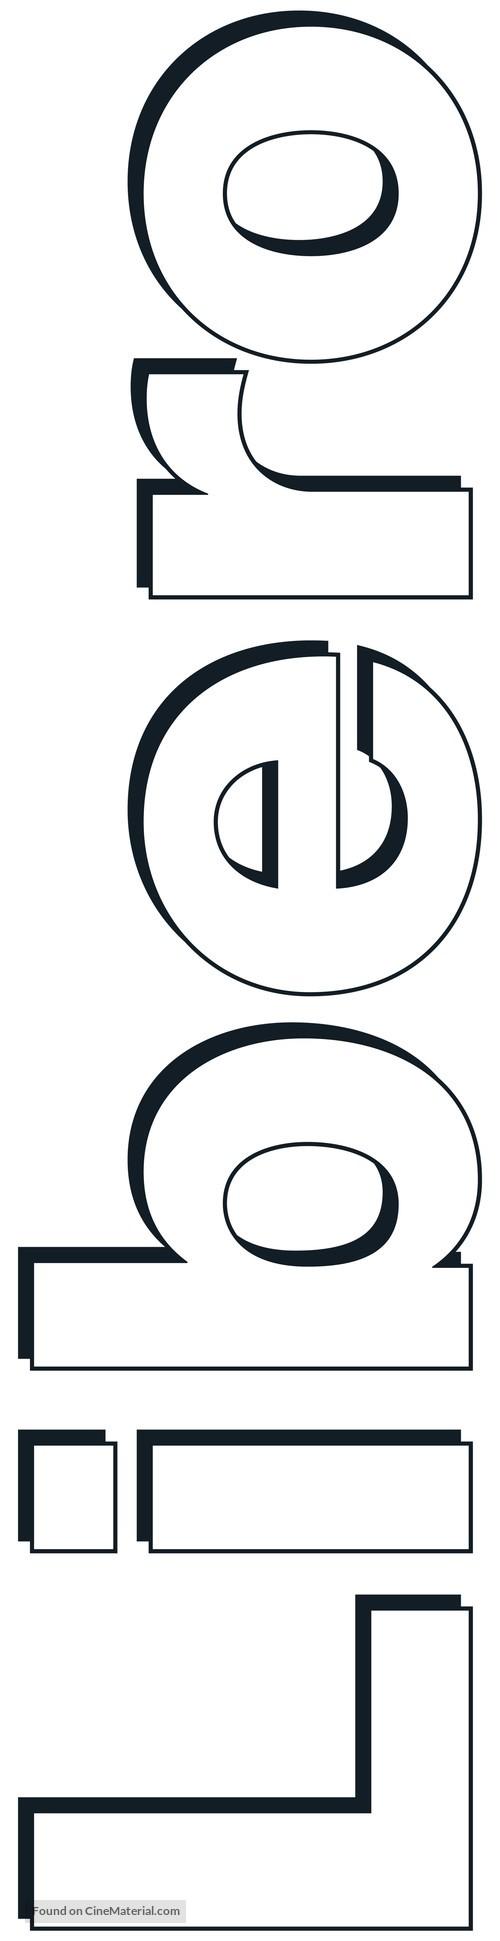 Anche libero va bene - French Logo